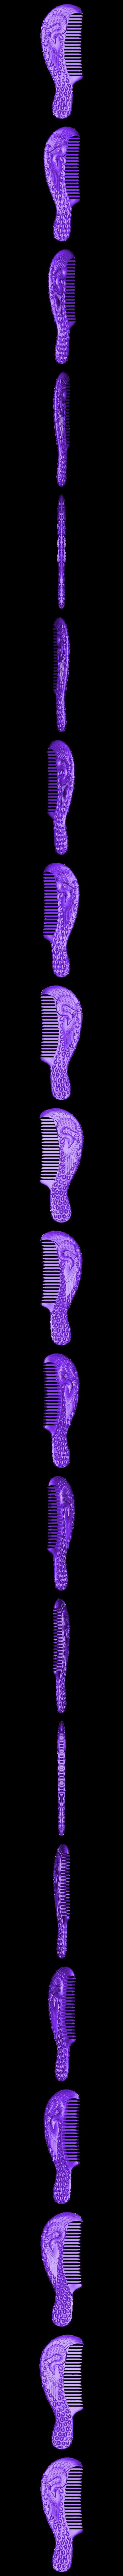 combpeacock.obj Download free OBJ file peocock comb • Design to 3D print, stlfilesfree